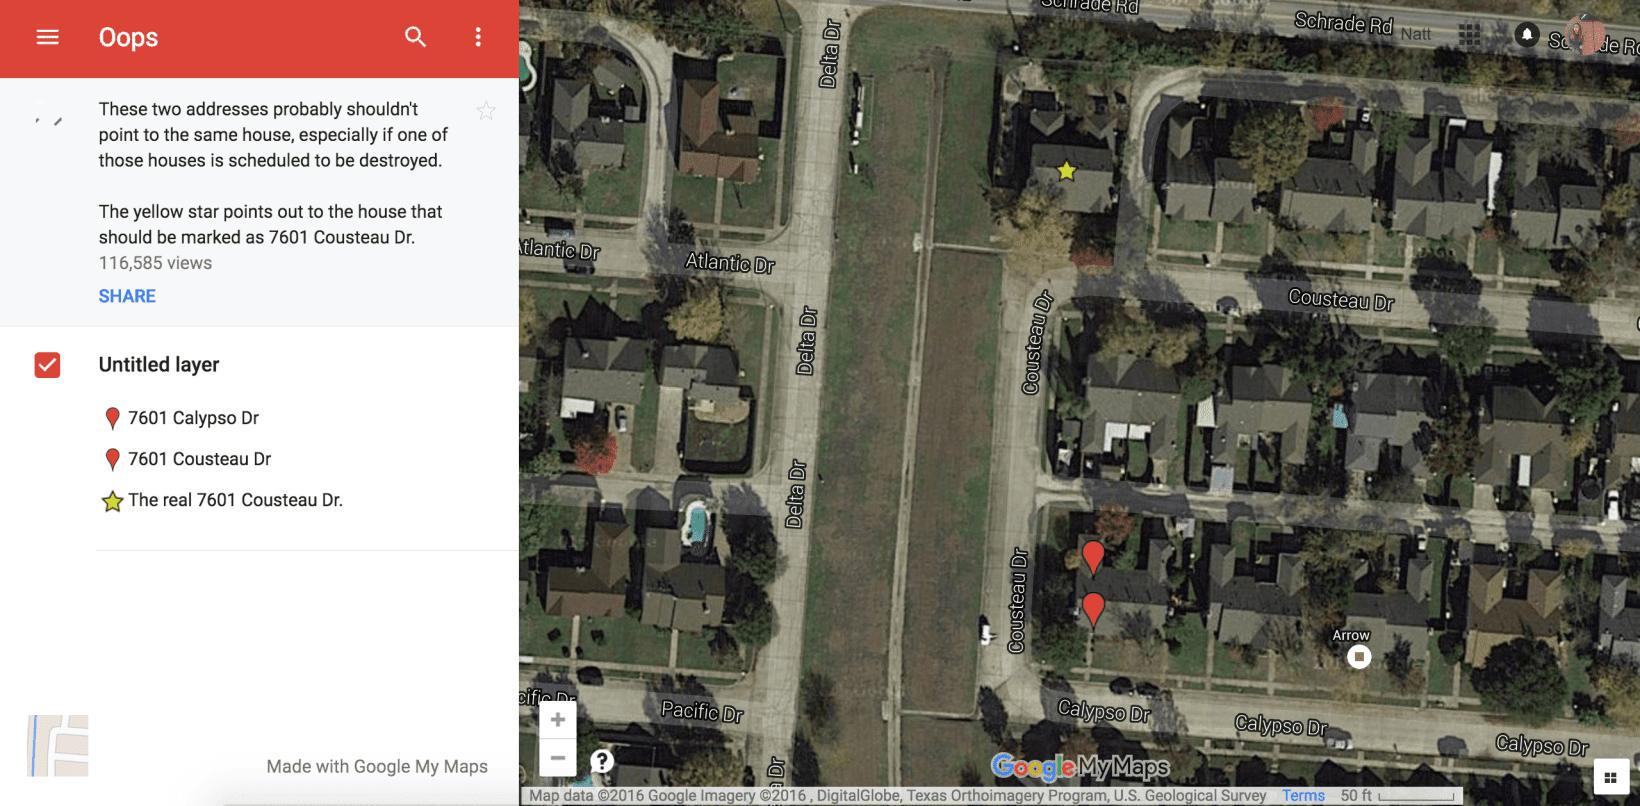 Demolition Company Says A Google Maps Error Led Them To